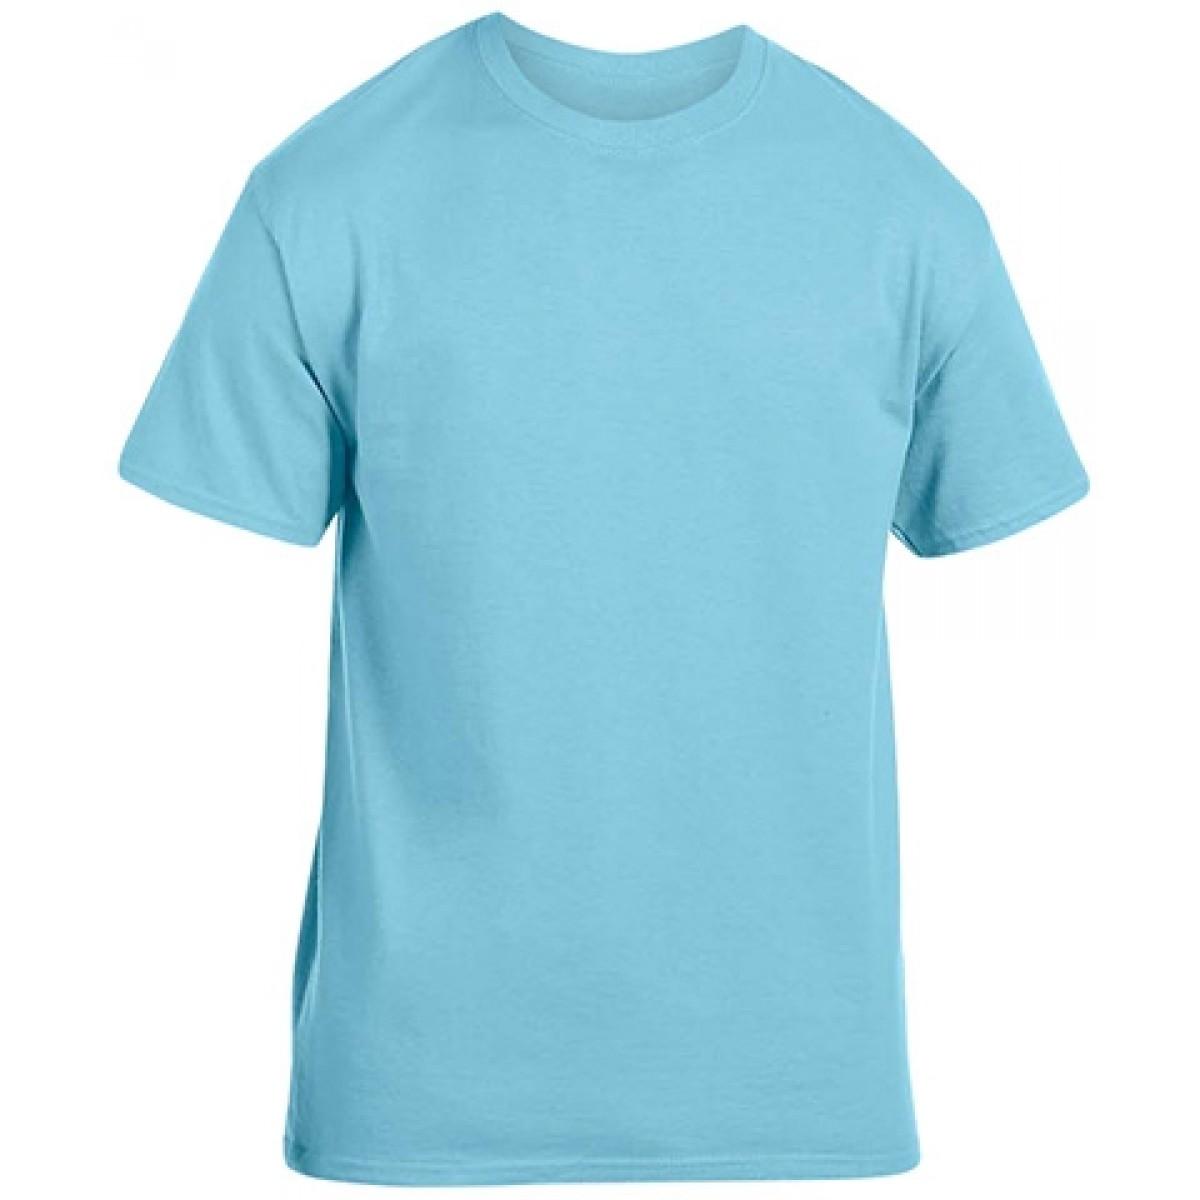 Soft 100% Cotton T-Shirt-Sky Blue-YS